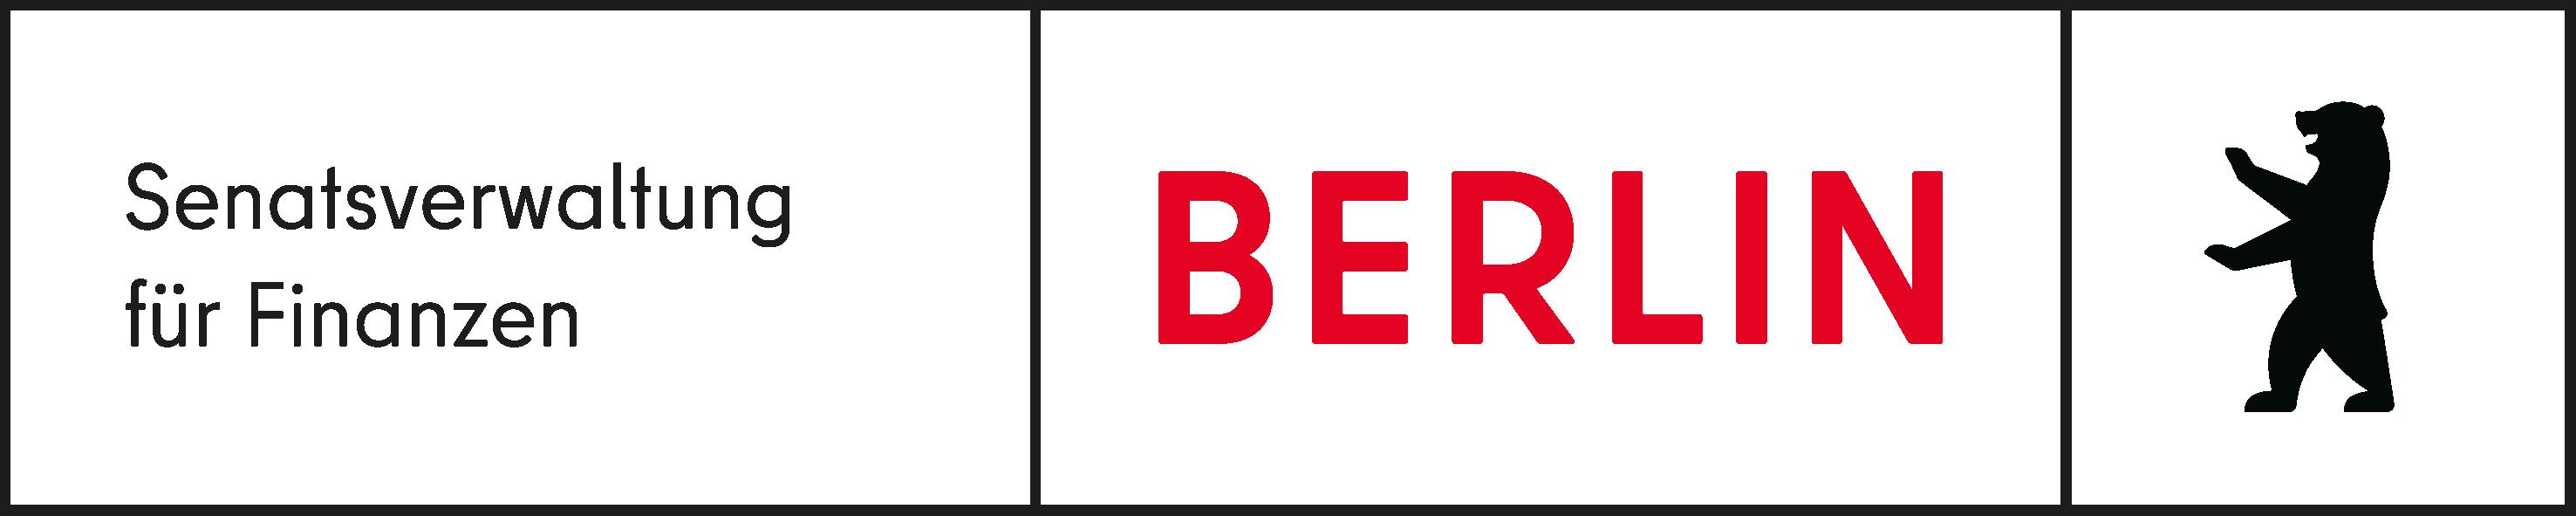 Stuzubi Berlin Ausstellerliste 10